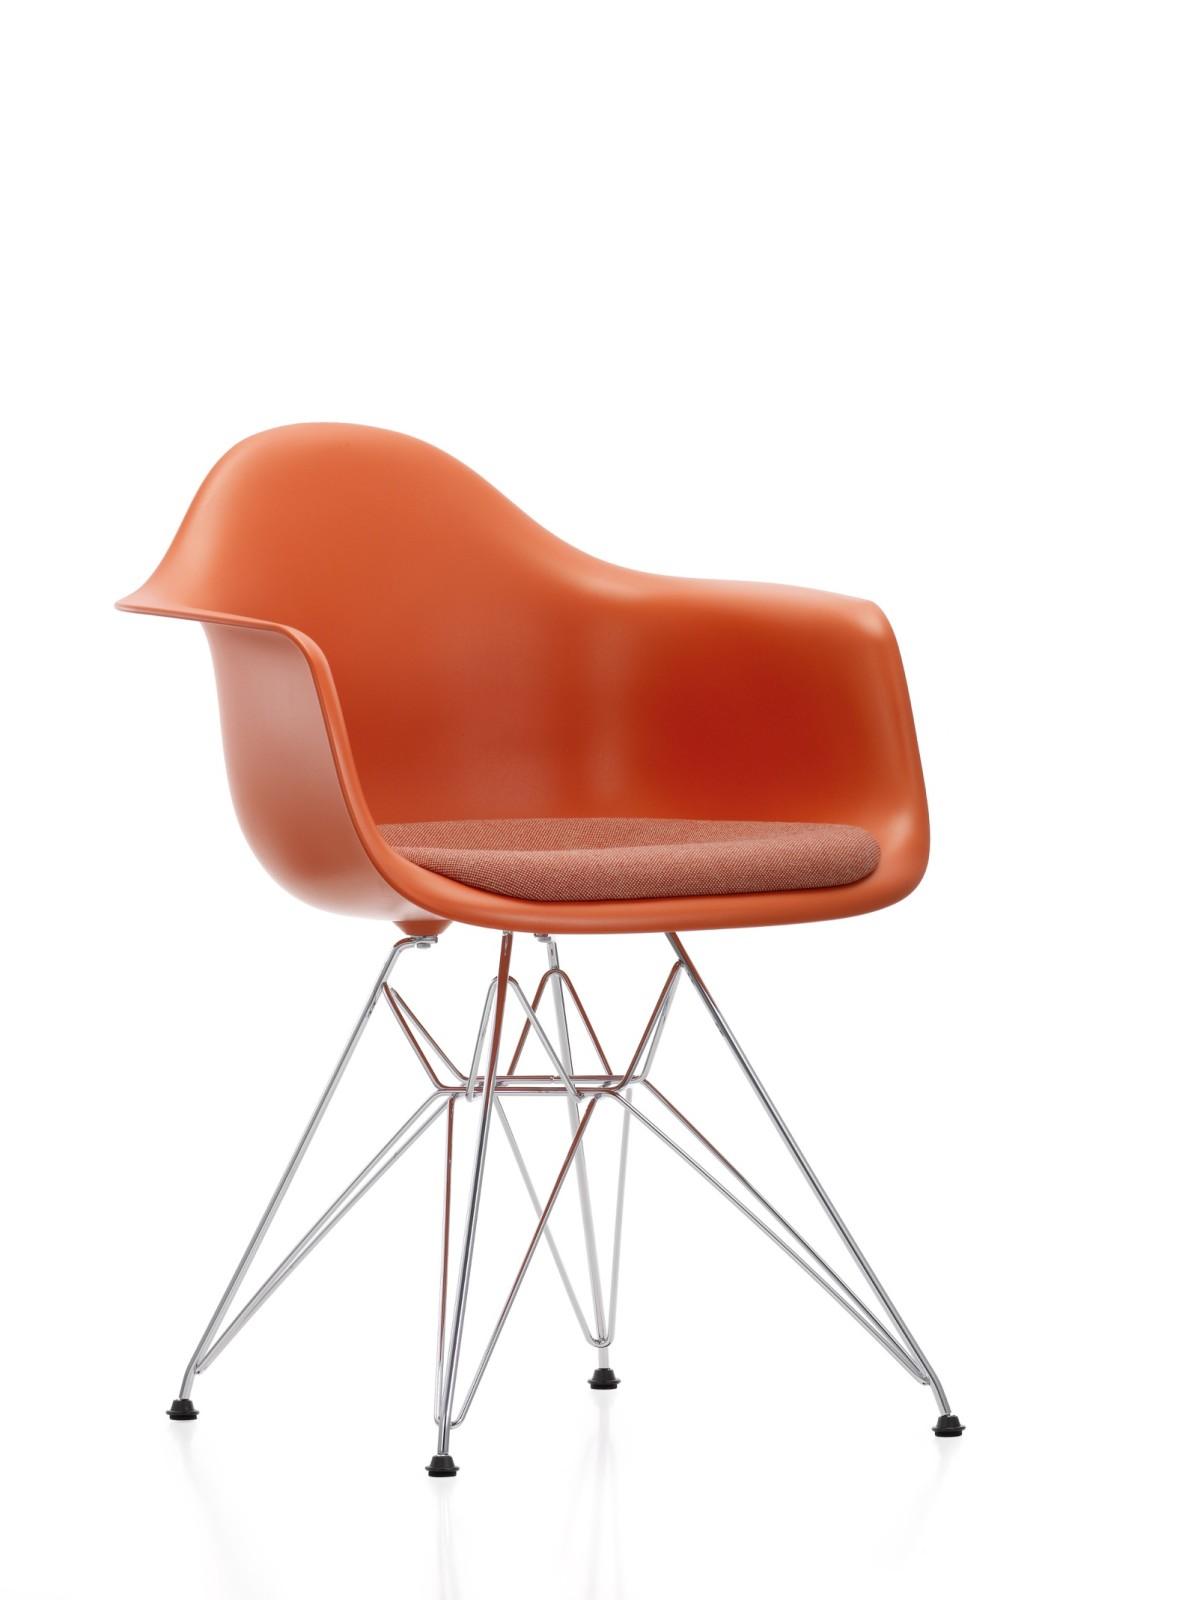 DAR Side Chair with Seat Upholstery 01 Chrome, 04 White, 04 Glides basic dark for carpet, Hopsak 79